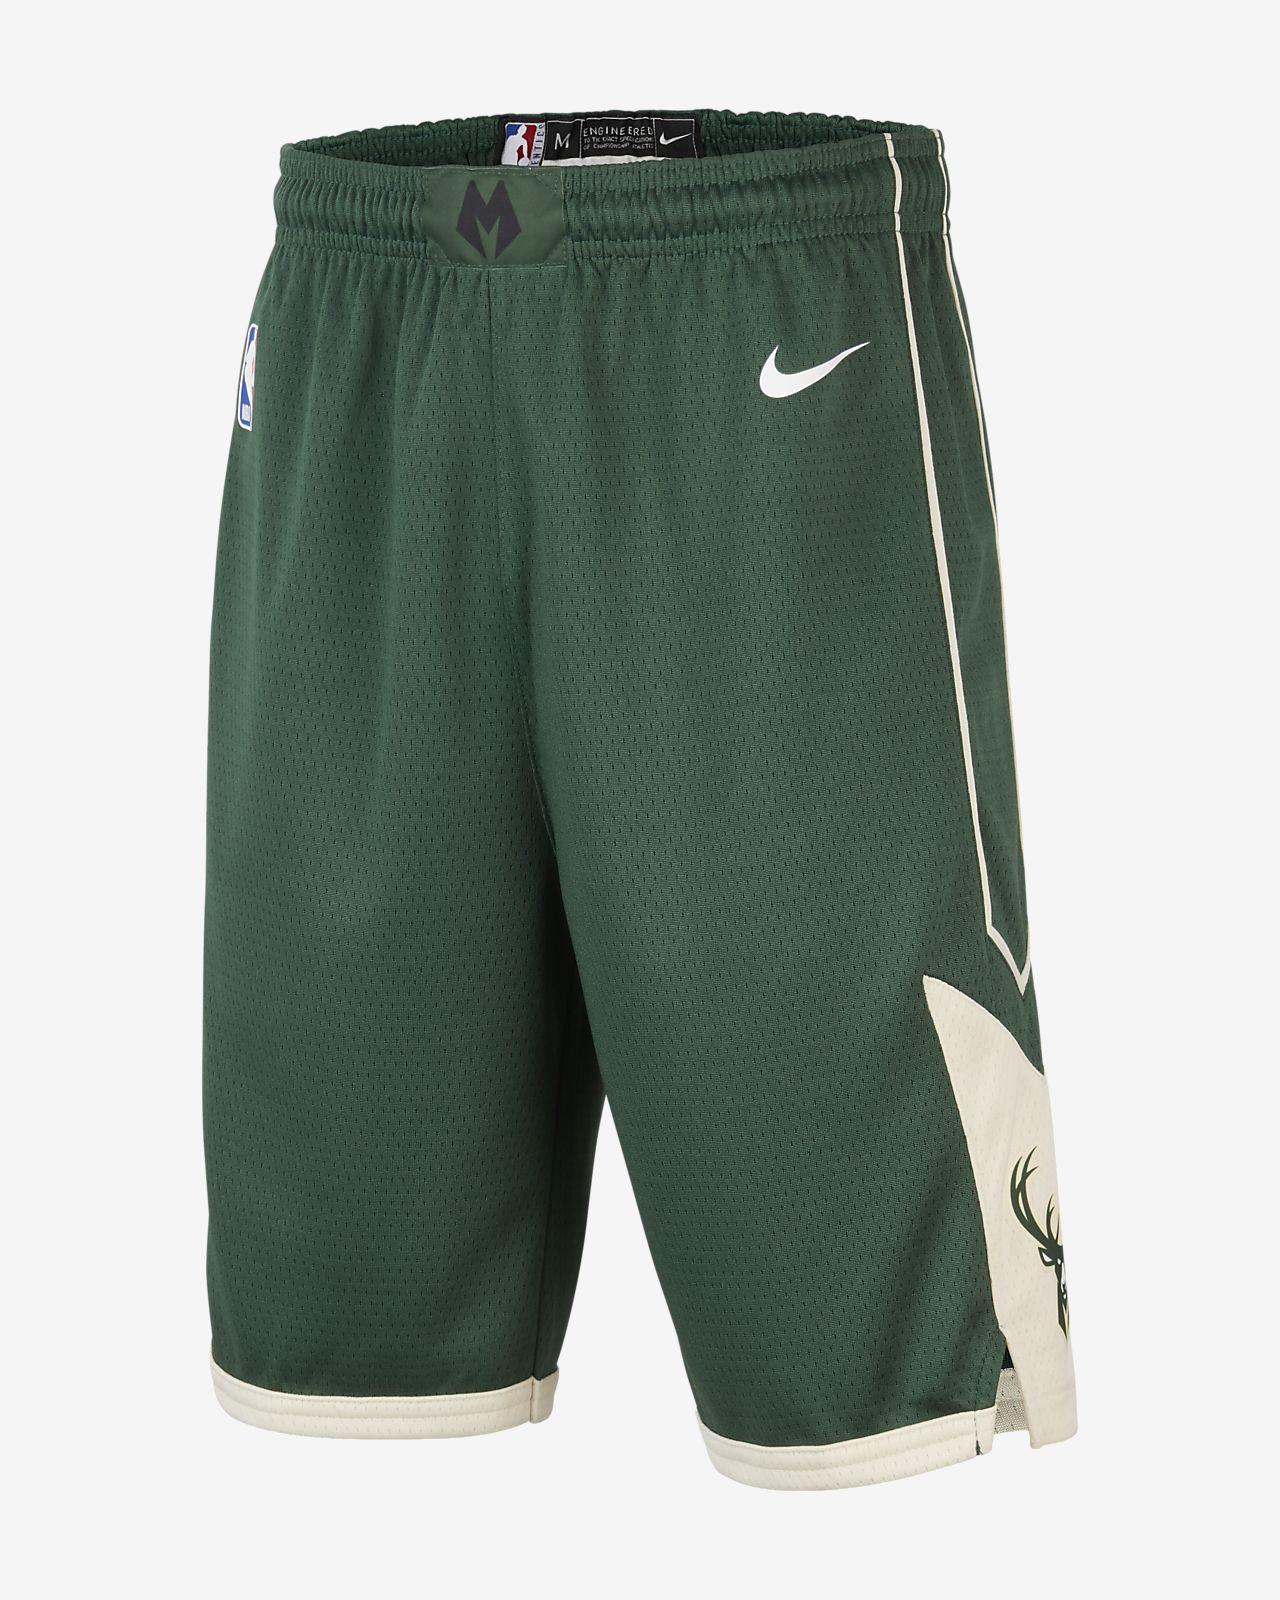 Shorts Milwaukee Bucks Nike Icon Edition Swingman NBA - Ragazzo